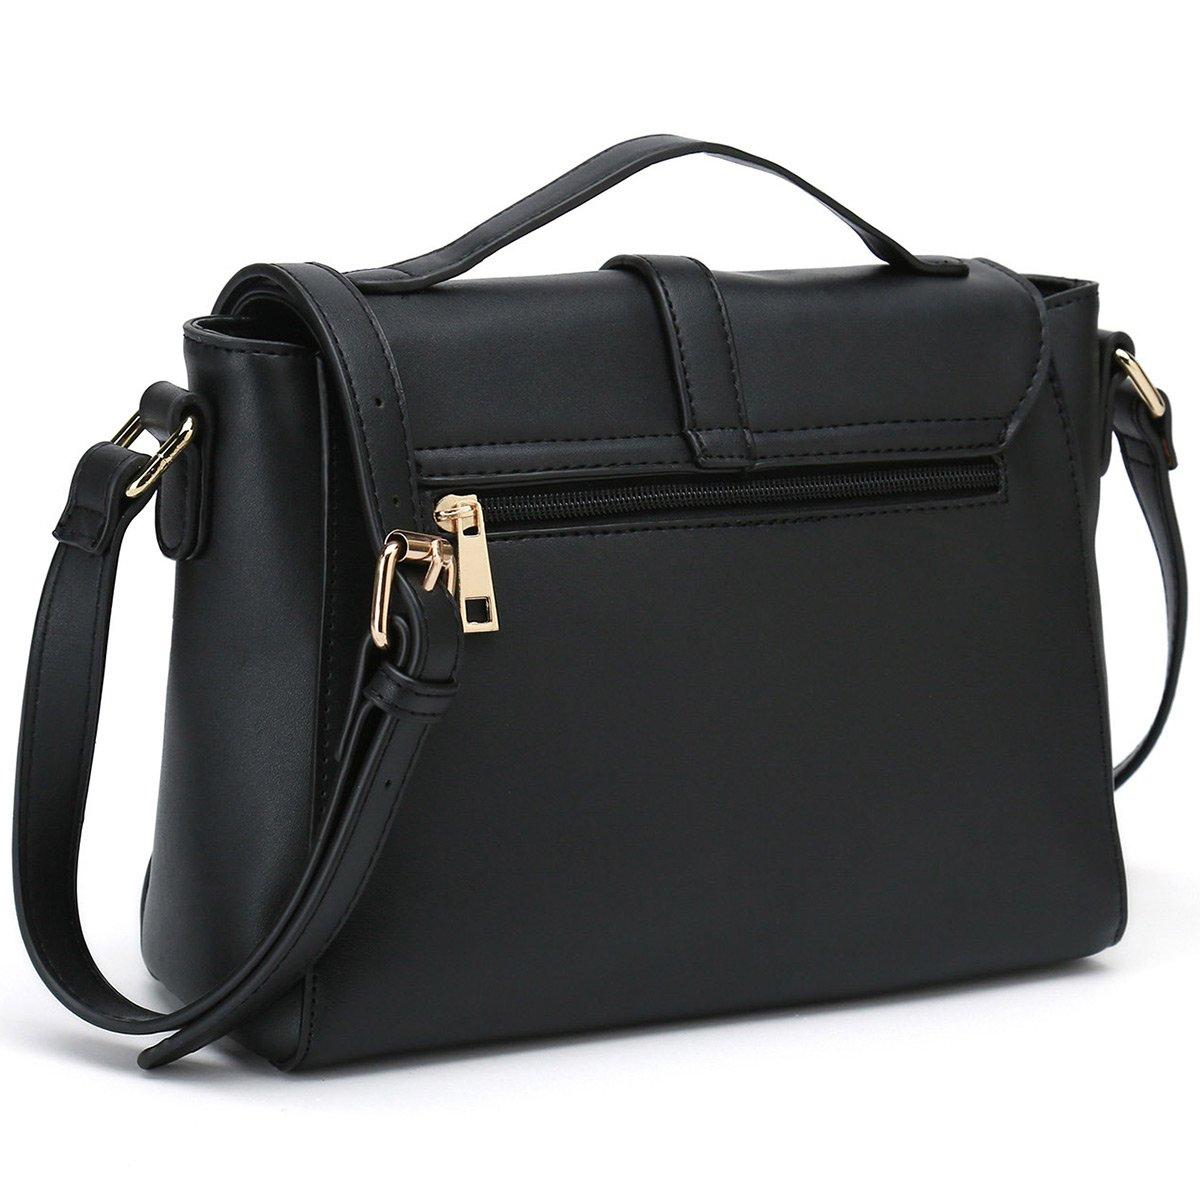 13f8d5a39ce4 Ladies Designer Purses Cross Body Handbags Trendy Bags for Women Shoulder  Bags (Black)  Handbags  Amazon.com